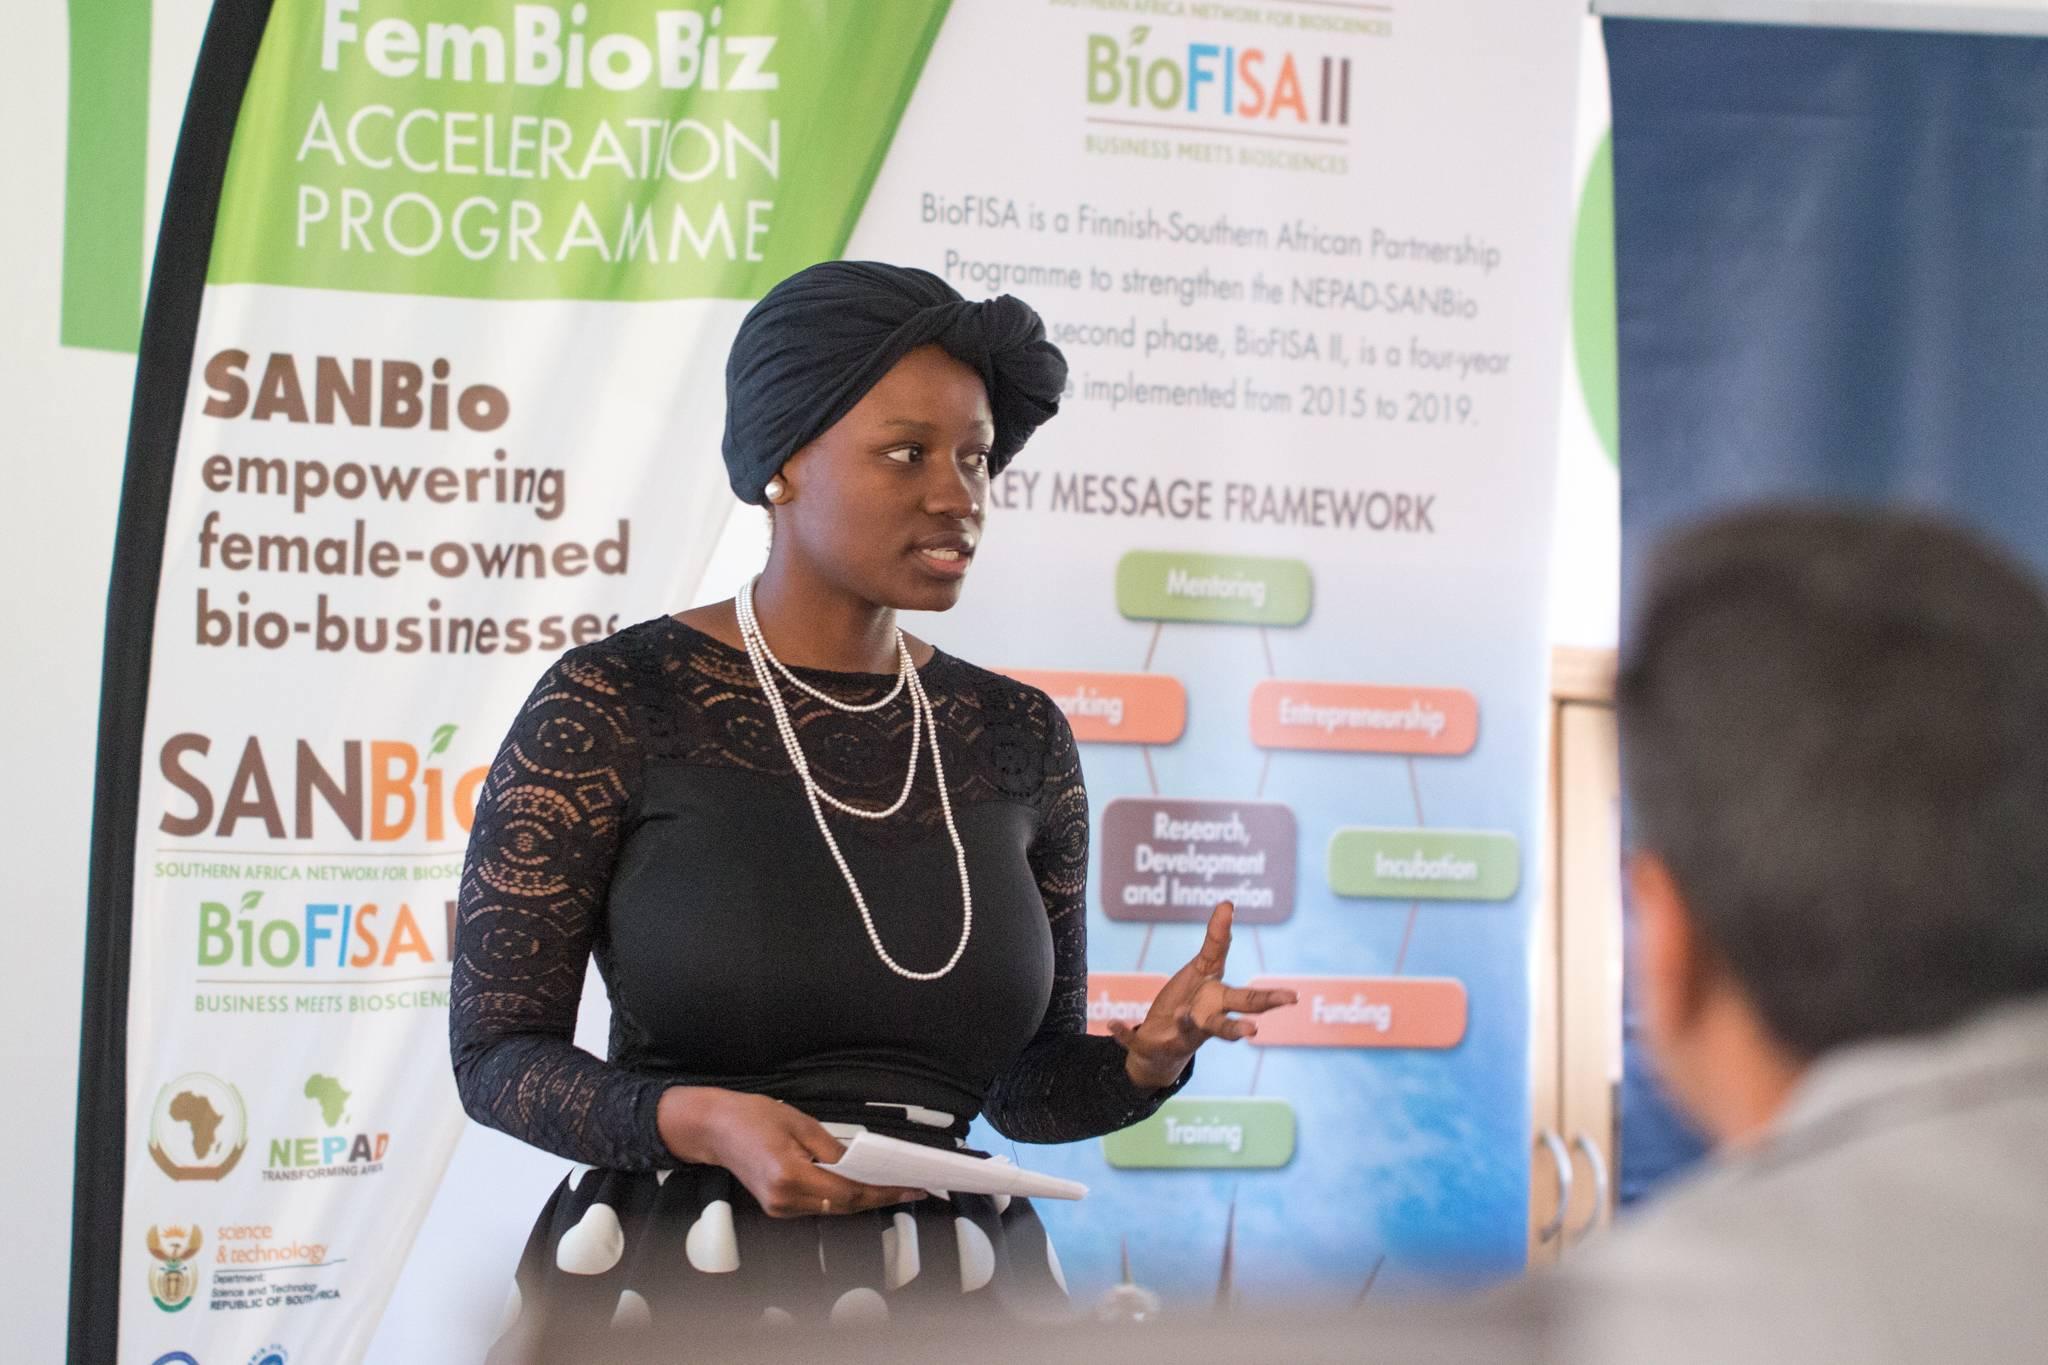 Hivos/SANbio FemBioBiz Acceleration Program 2019 for Women Entrepreneurs